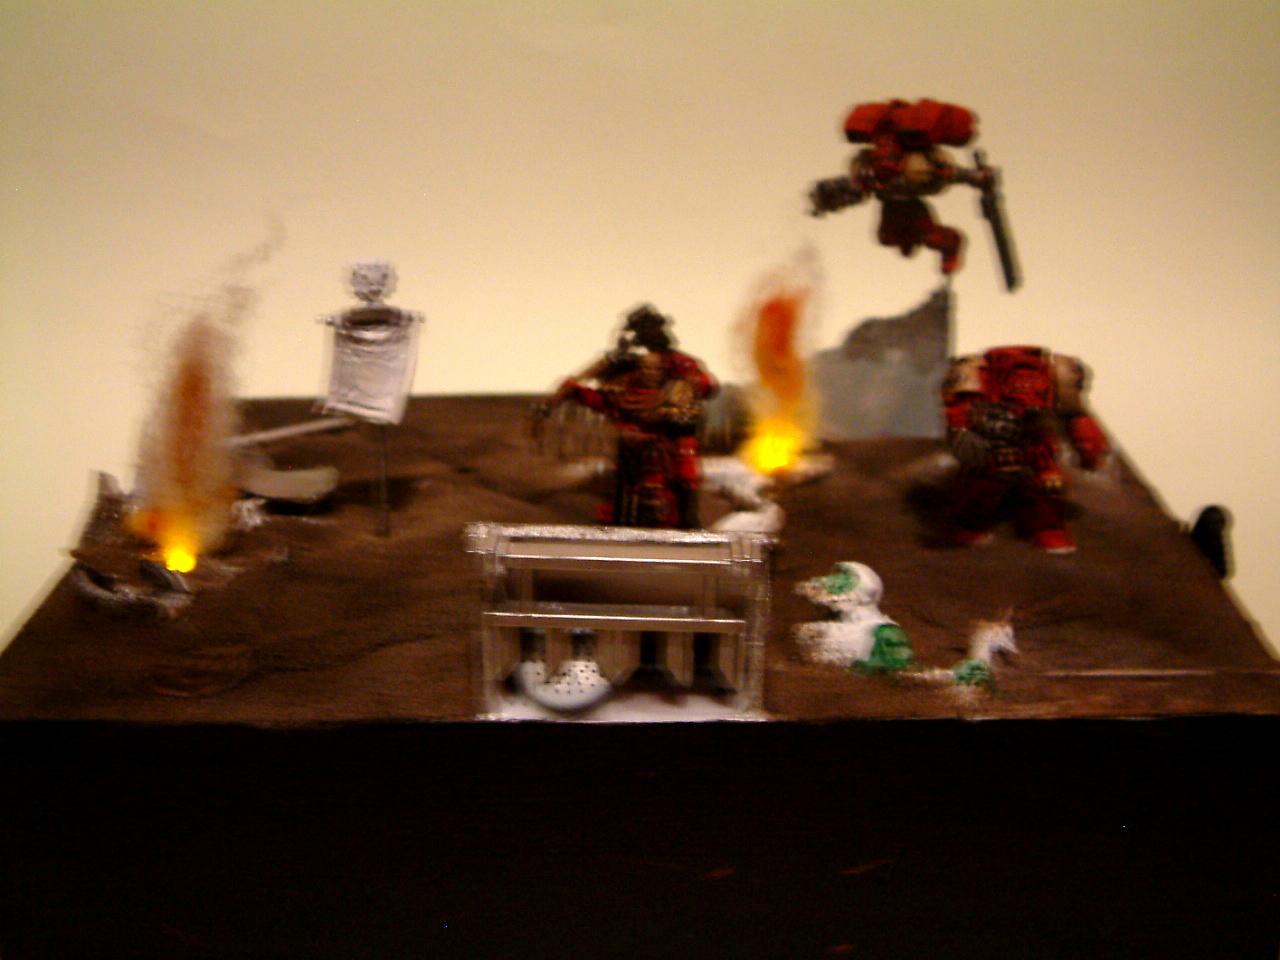 Blood, Blurred Photo, Dawn, Diorama, Fire, Of, Ravens, Smoke, Space, Space Marines, War, Warhammer 40,000